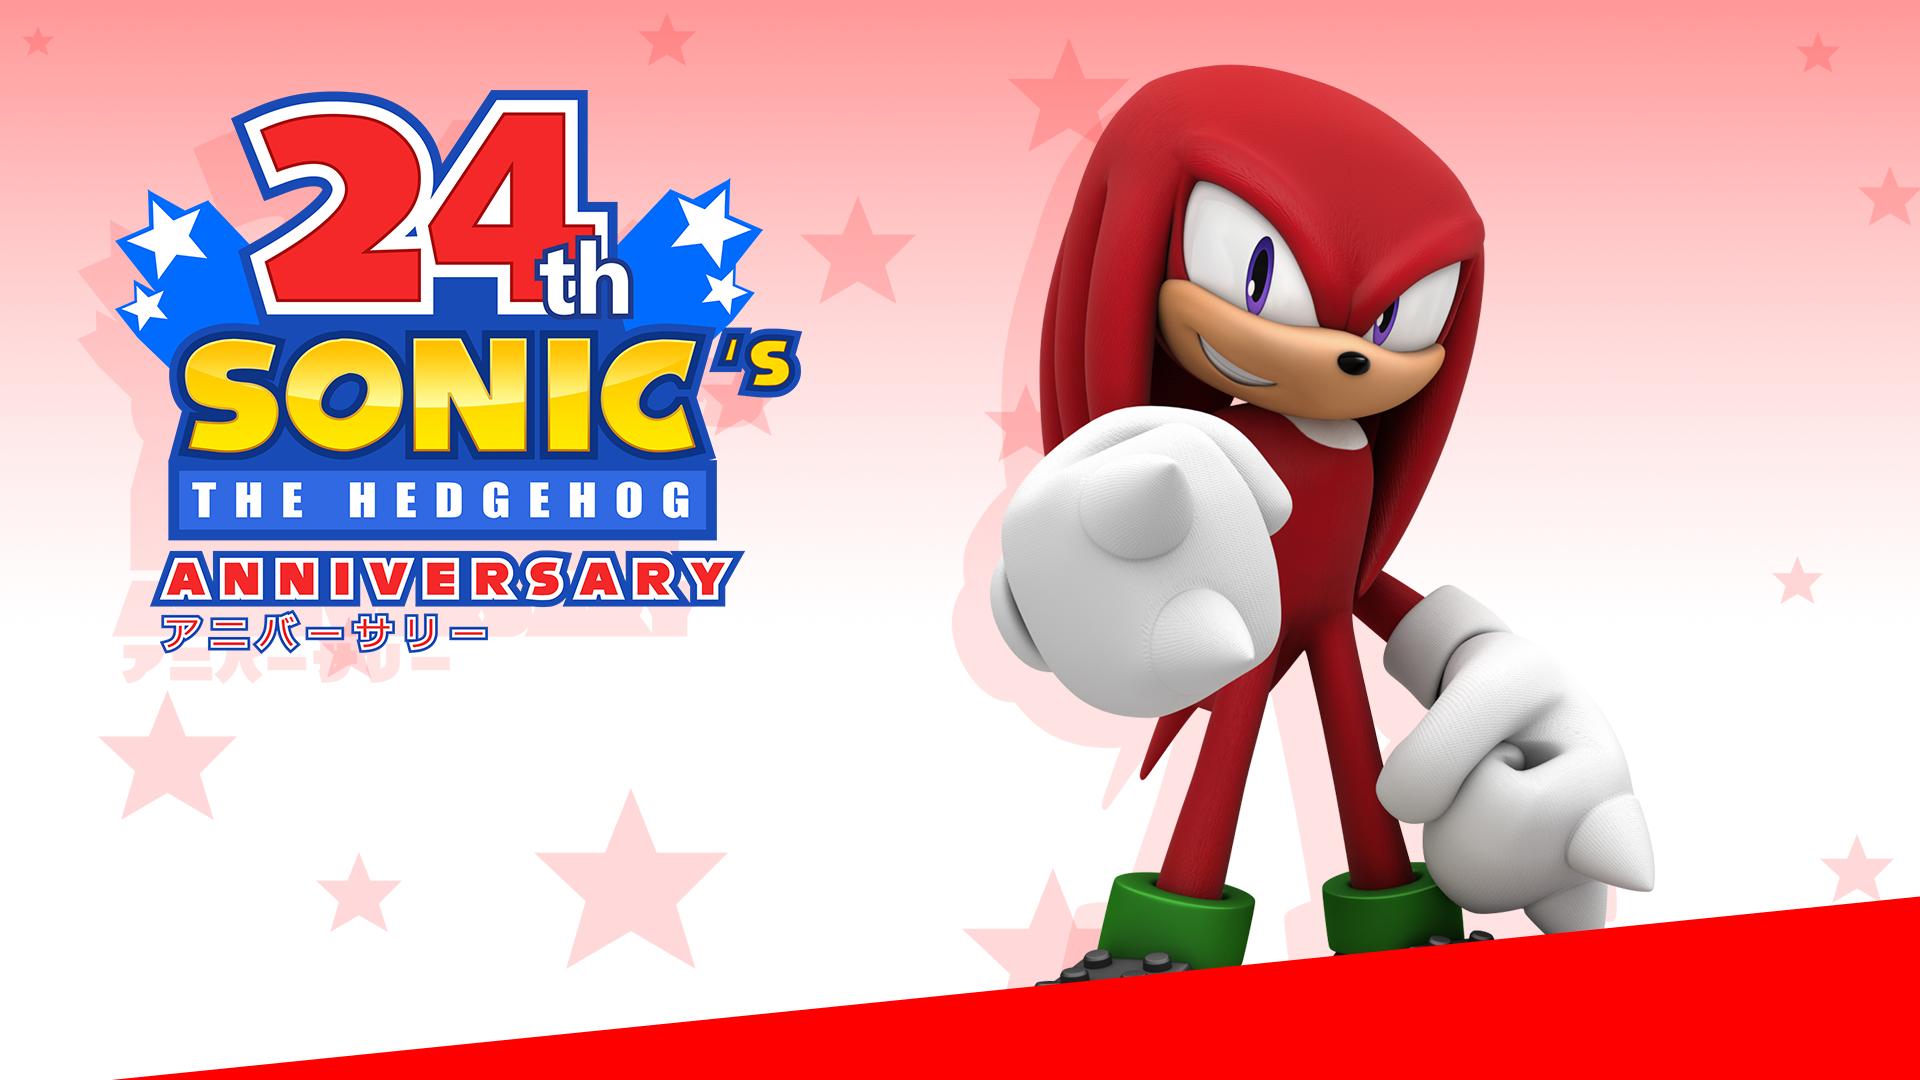 Sonic 24th Anniversary Wallpaper - Knuckles - by NuryRush